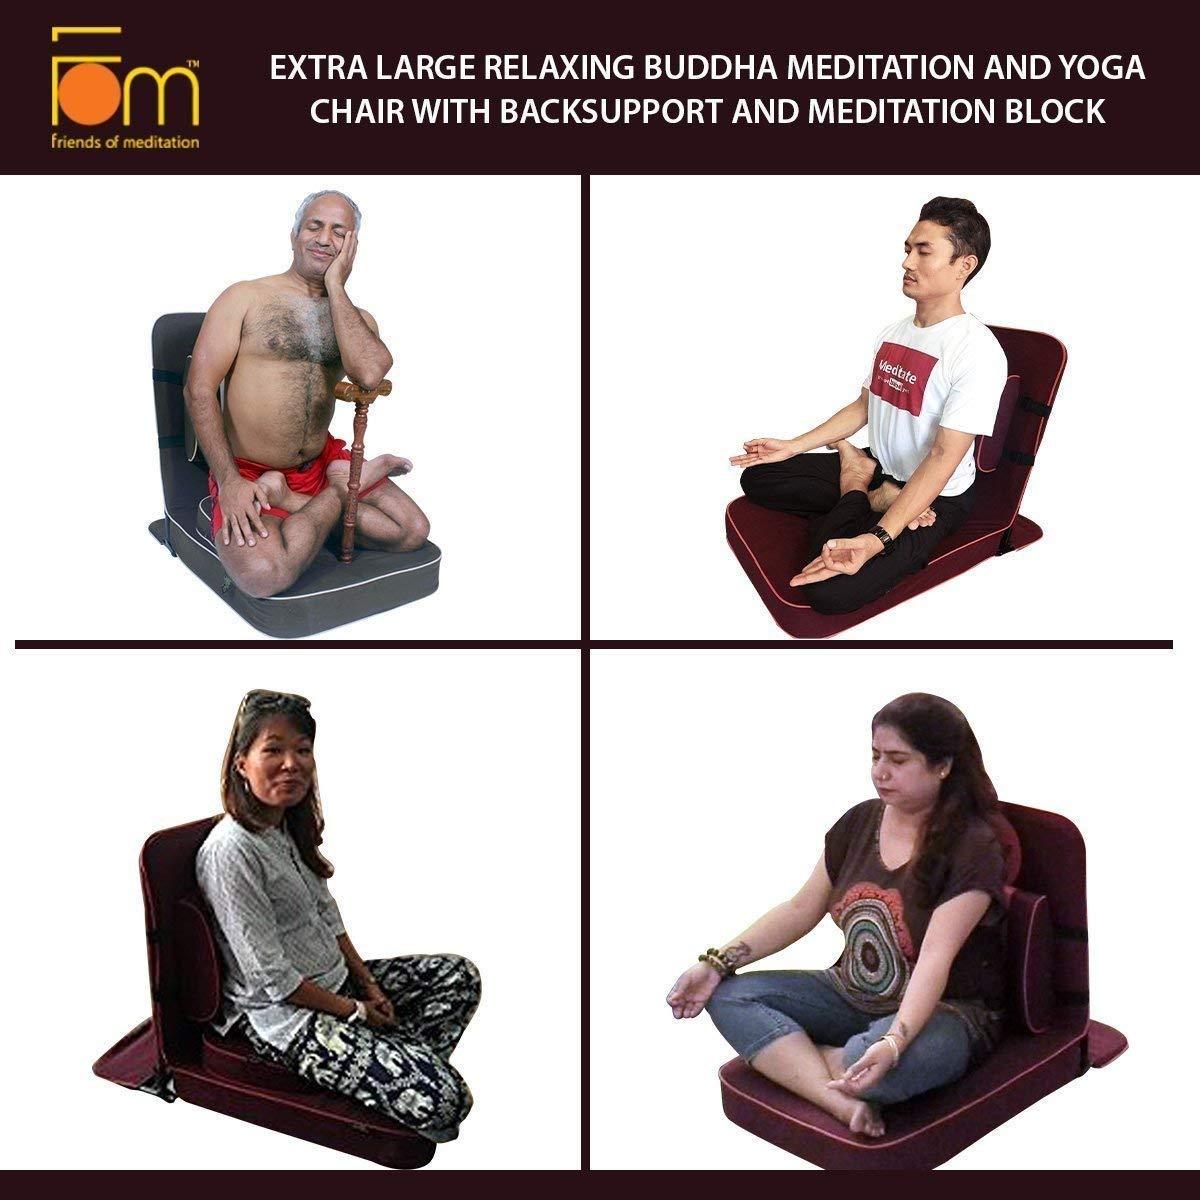 Marineblau Gr/ö/ße XL mit R/ückenst/ütze und Meditationsblock Friends of Meditation Buddha Meditations- und Yoga-Stuhl